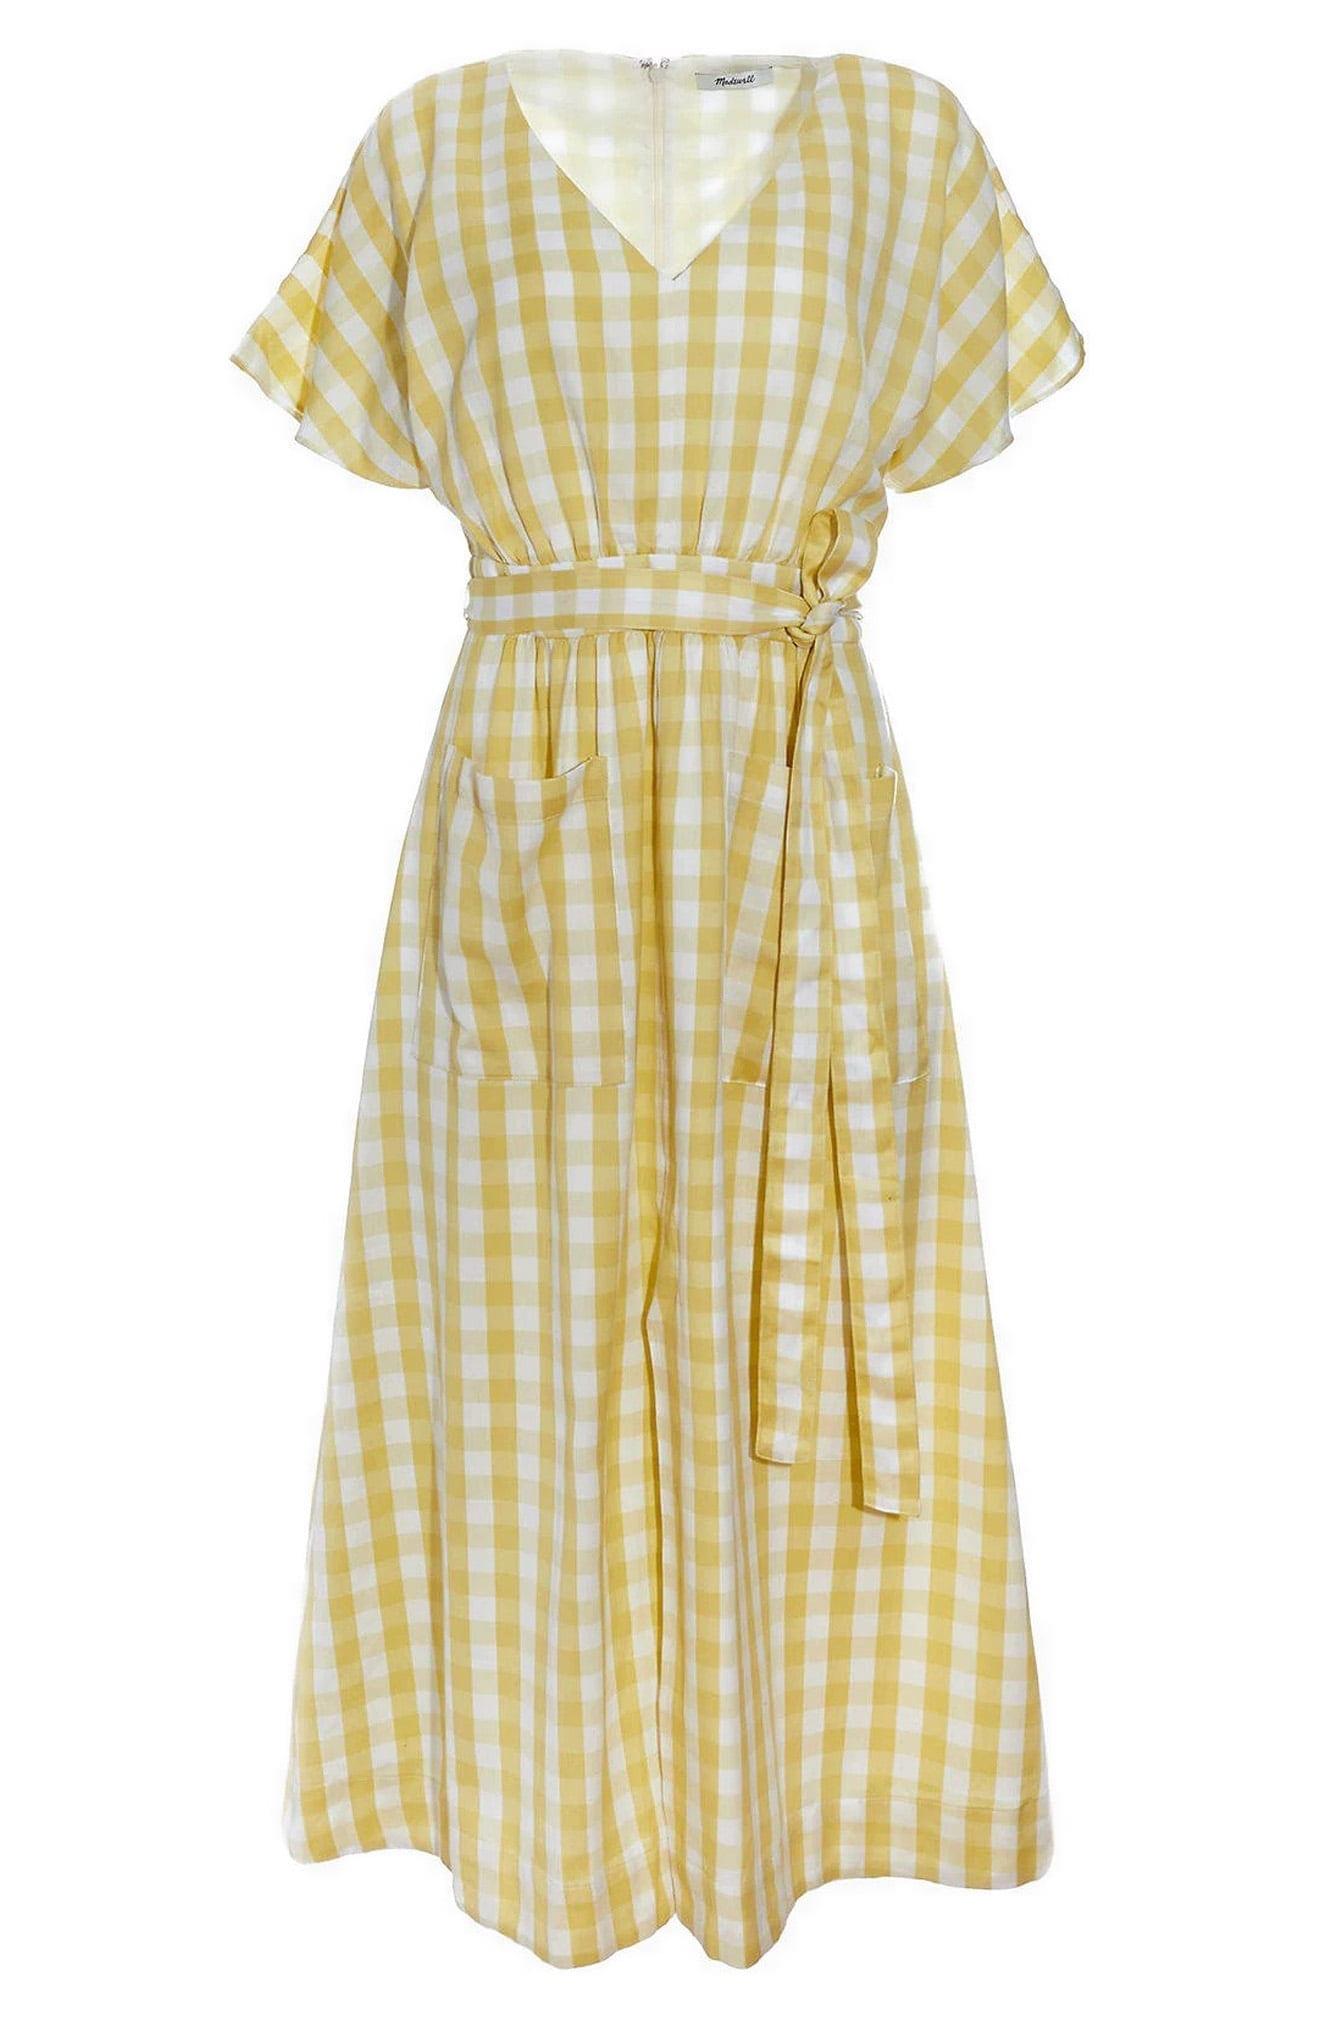 MADEWELL Gingham Check Dolman Sleeve Tie Waist Midi Dress